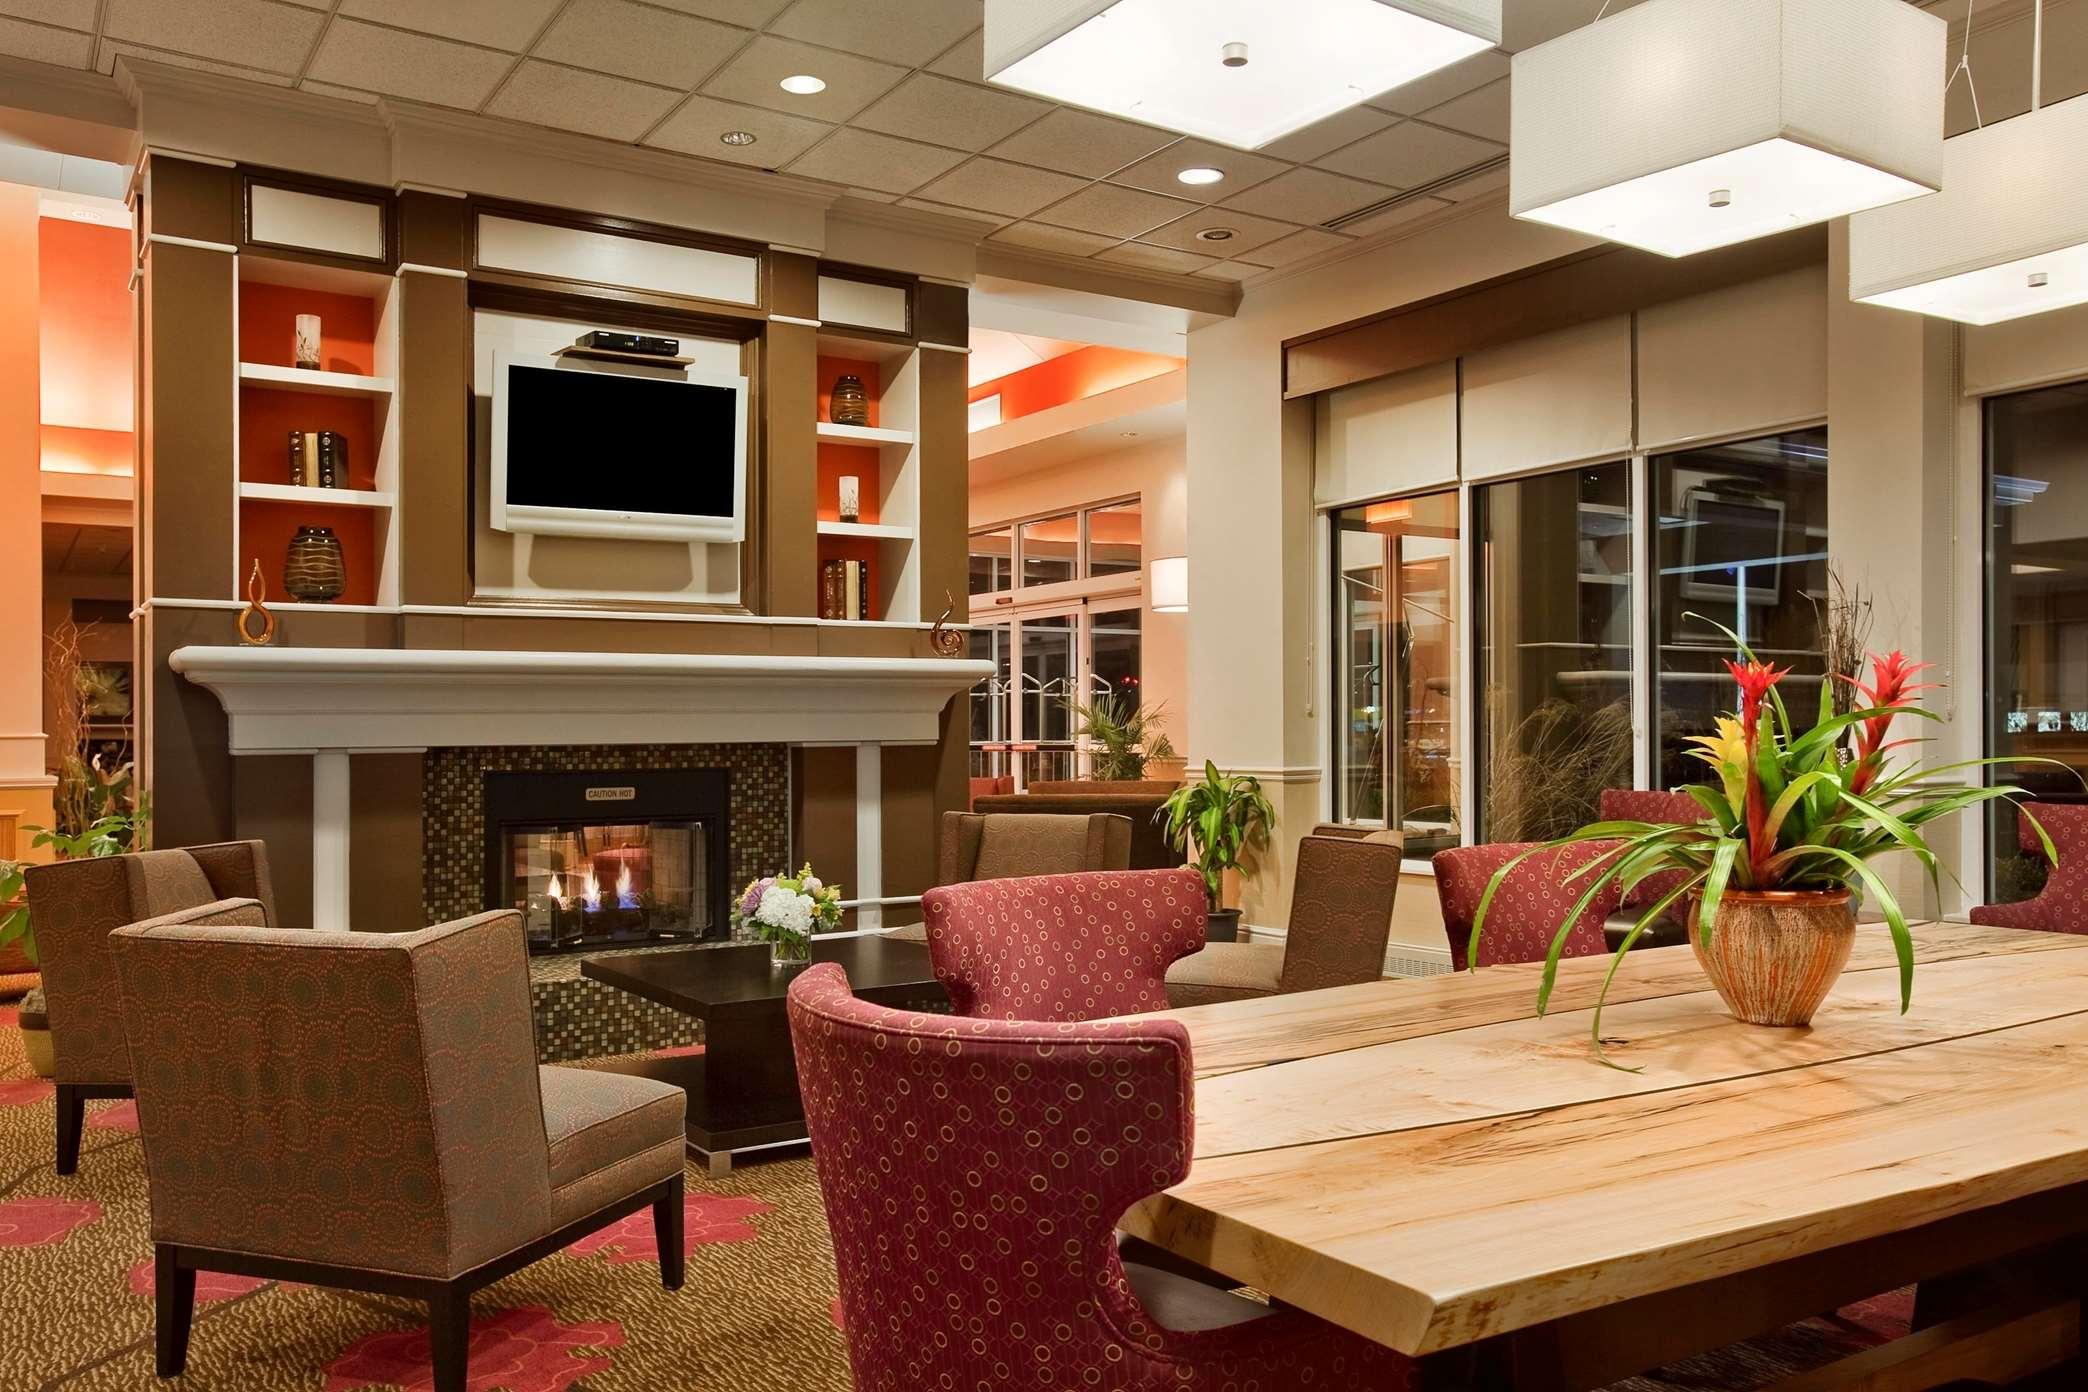 Hilton Garden Inn Islip/MacArthur Airport image 4